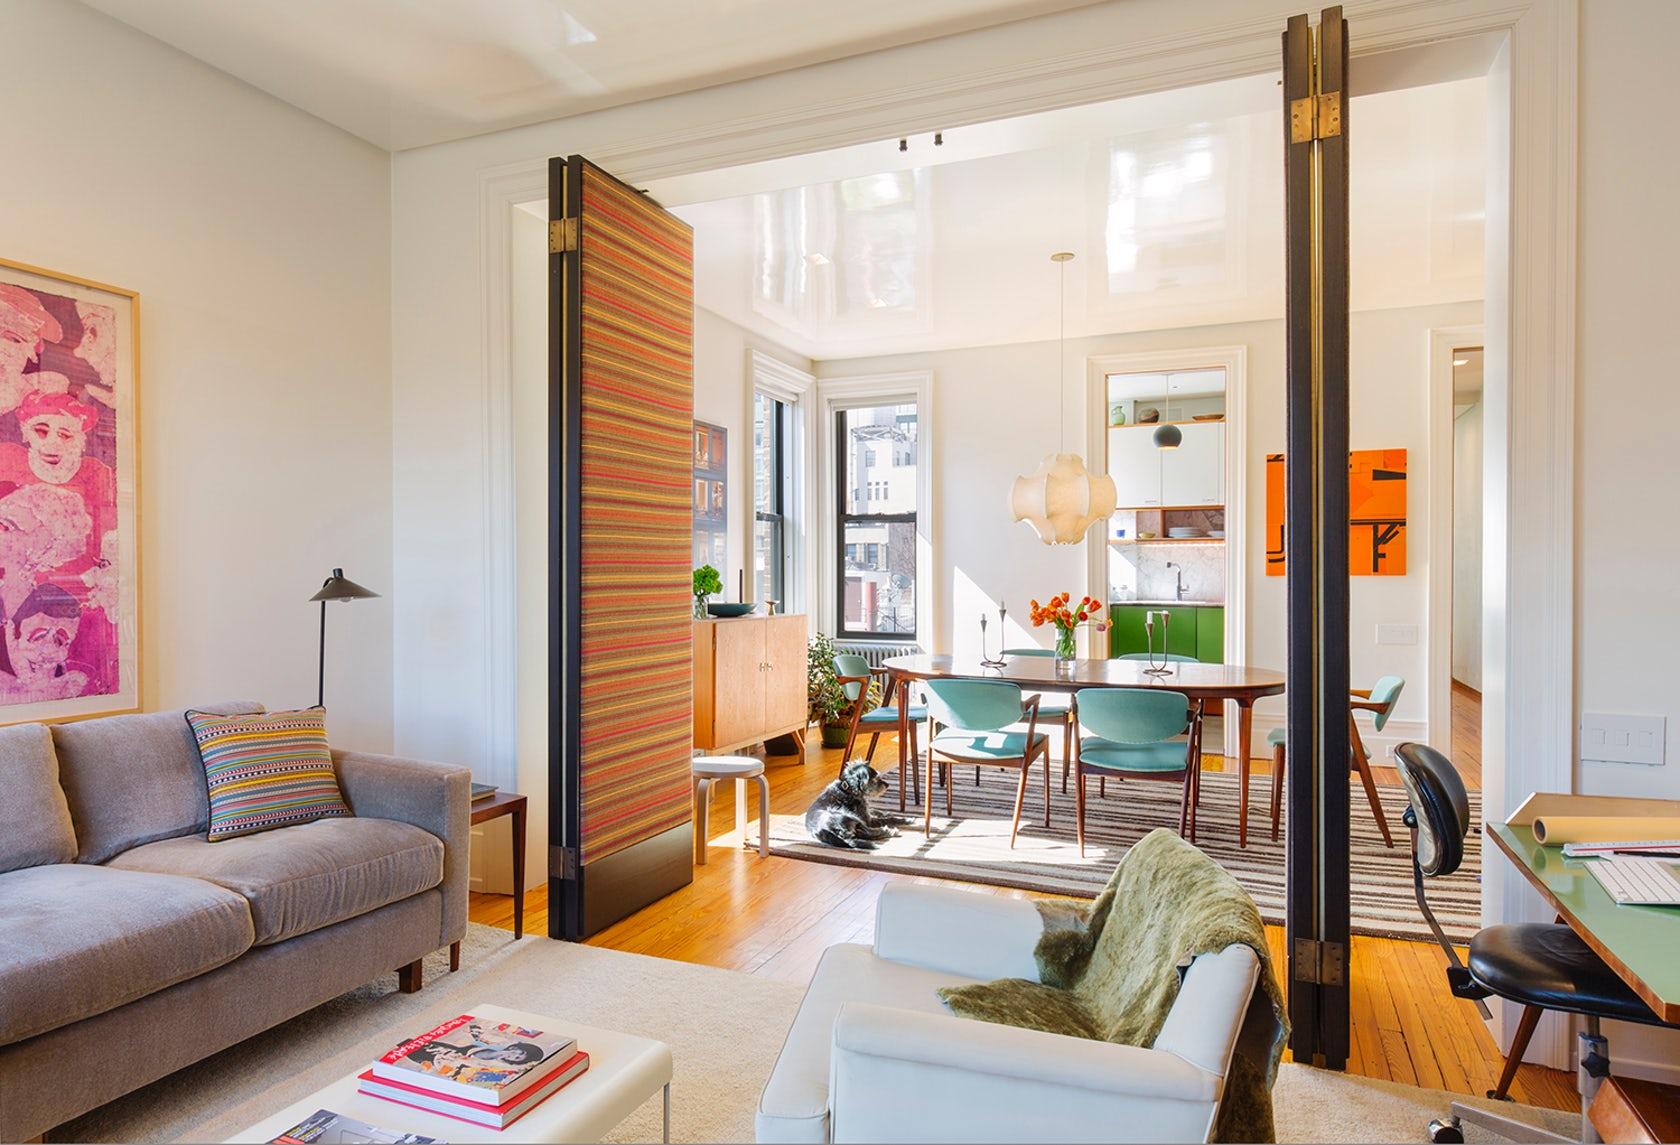 Posted On Mon, September 25, 2017 By Emily Nonko In Chelsea, Design,  Interiors